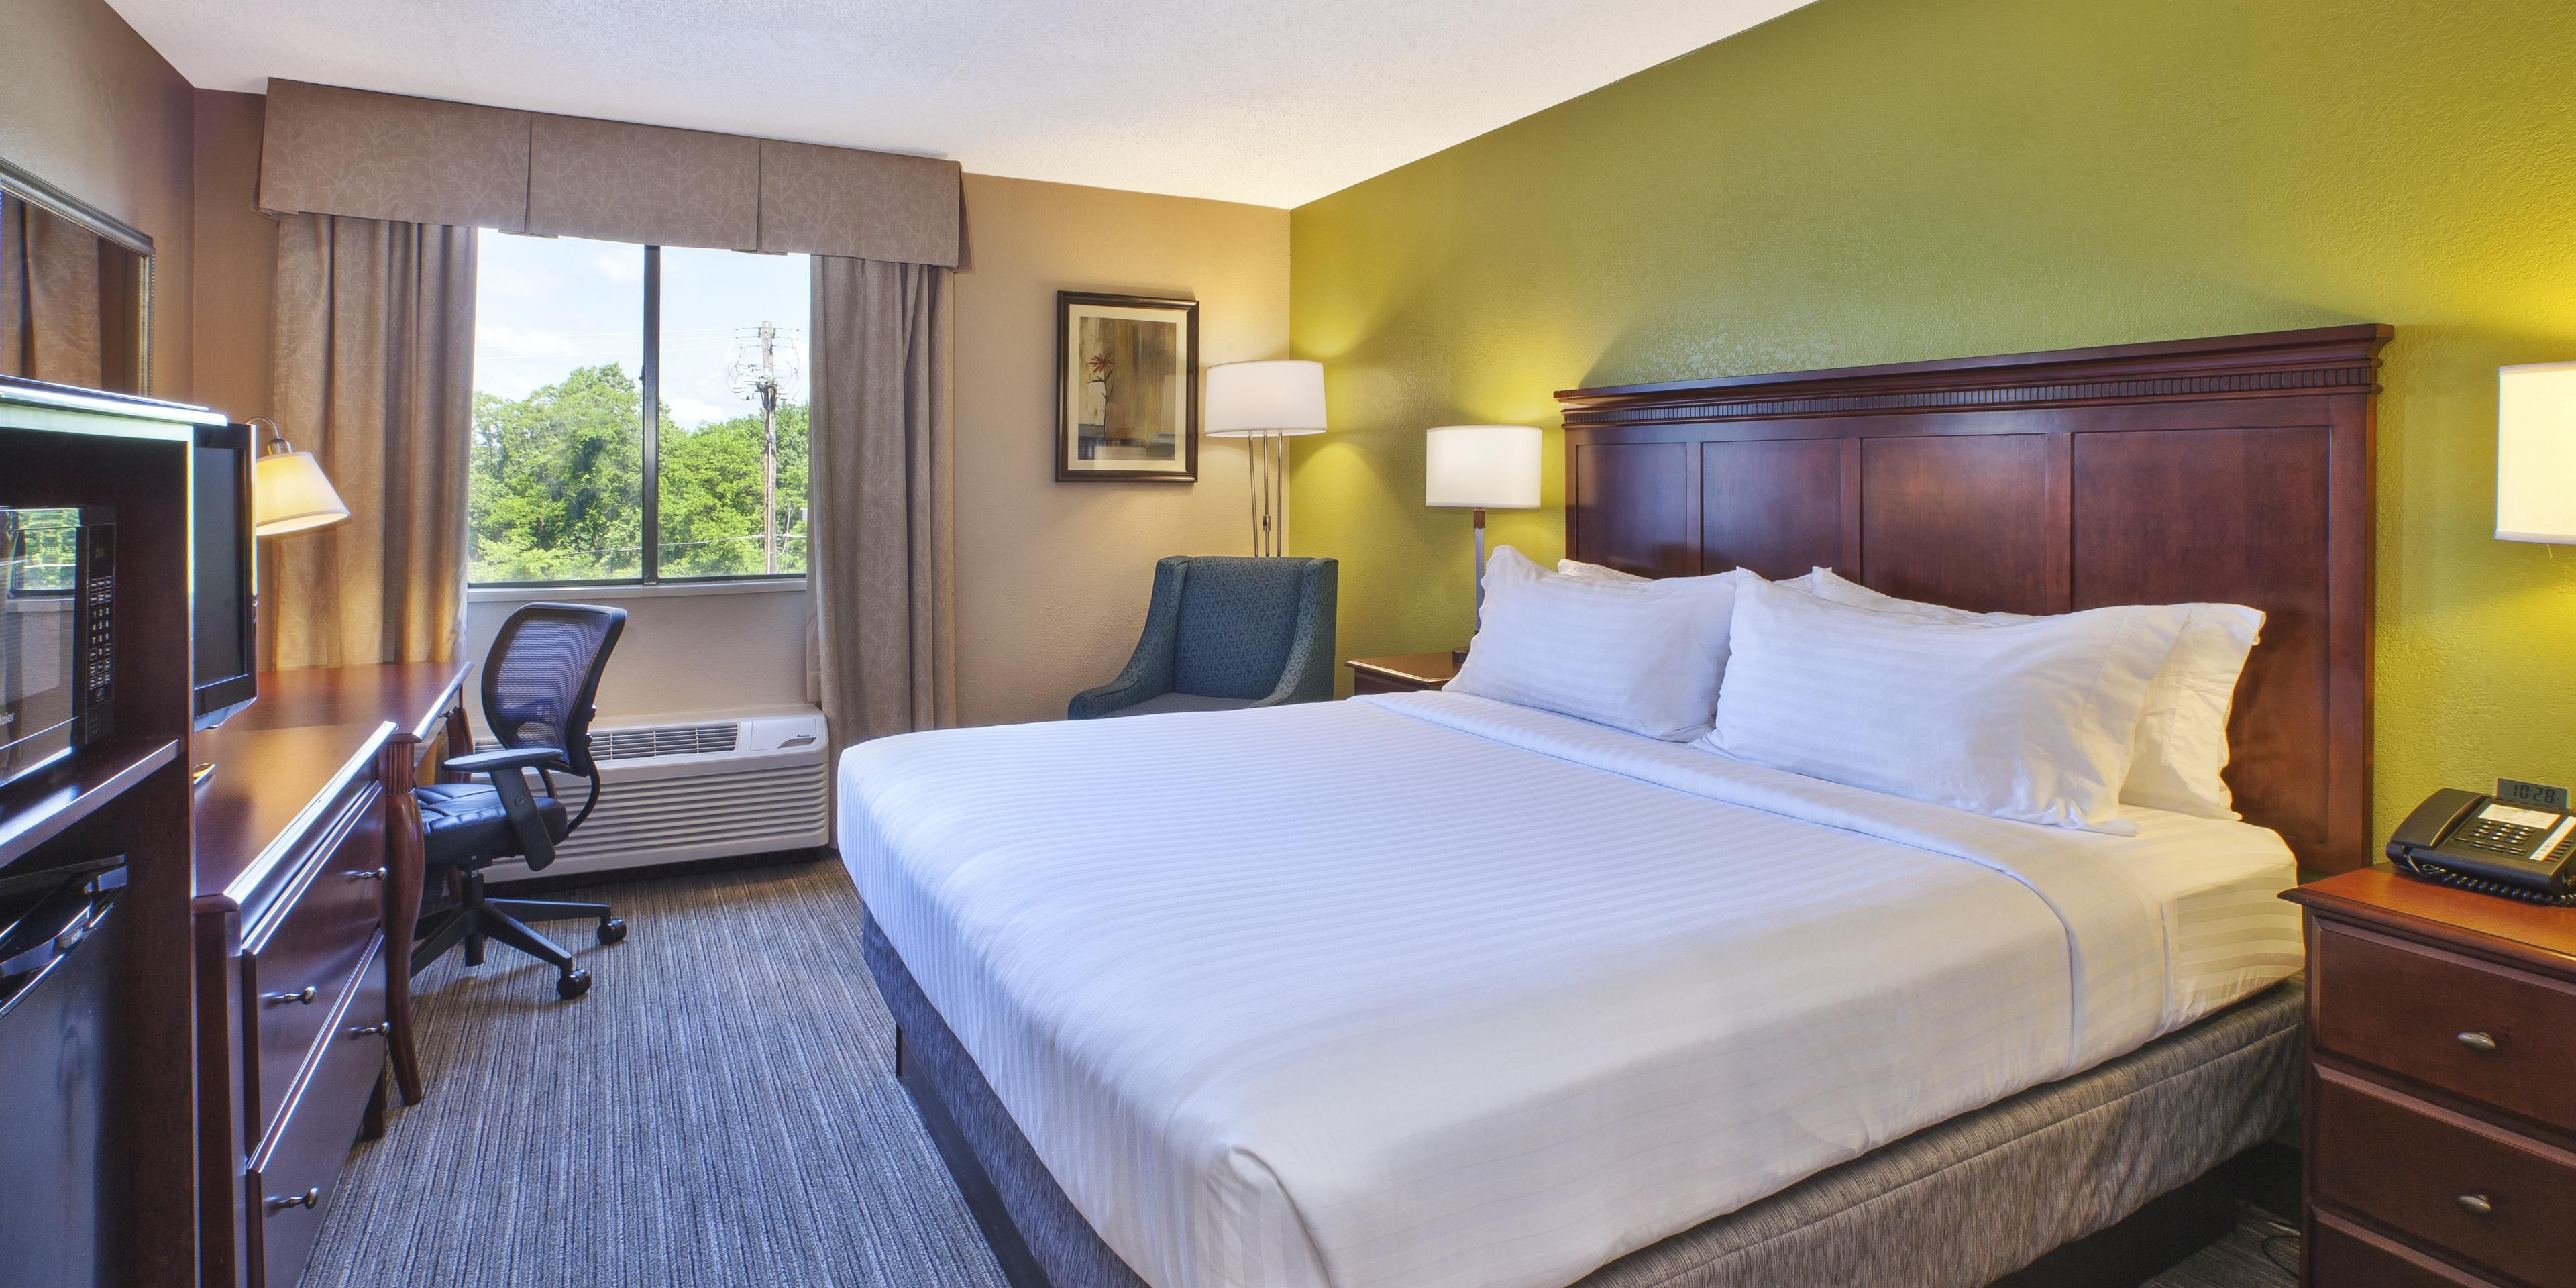 Holiday Inn Express & Suites Germantown - Gaithersburg Hotel by IHG